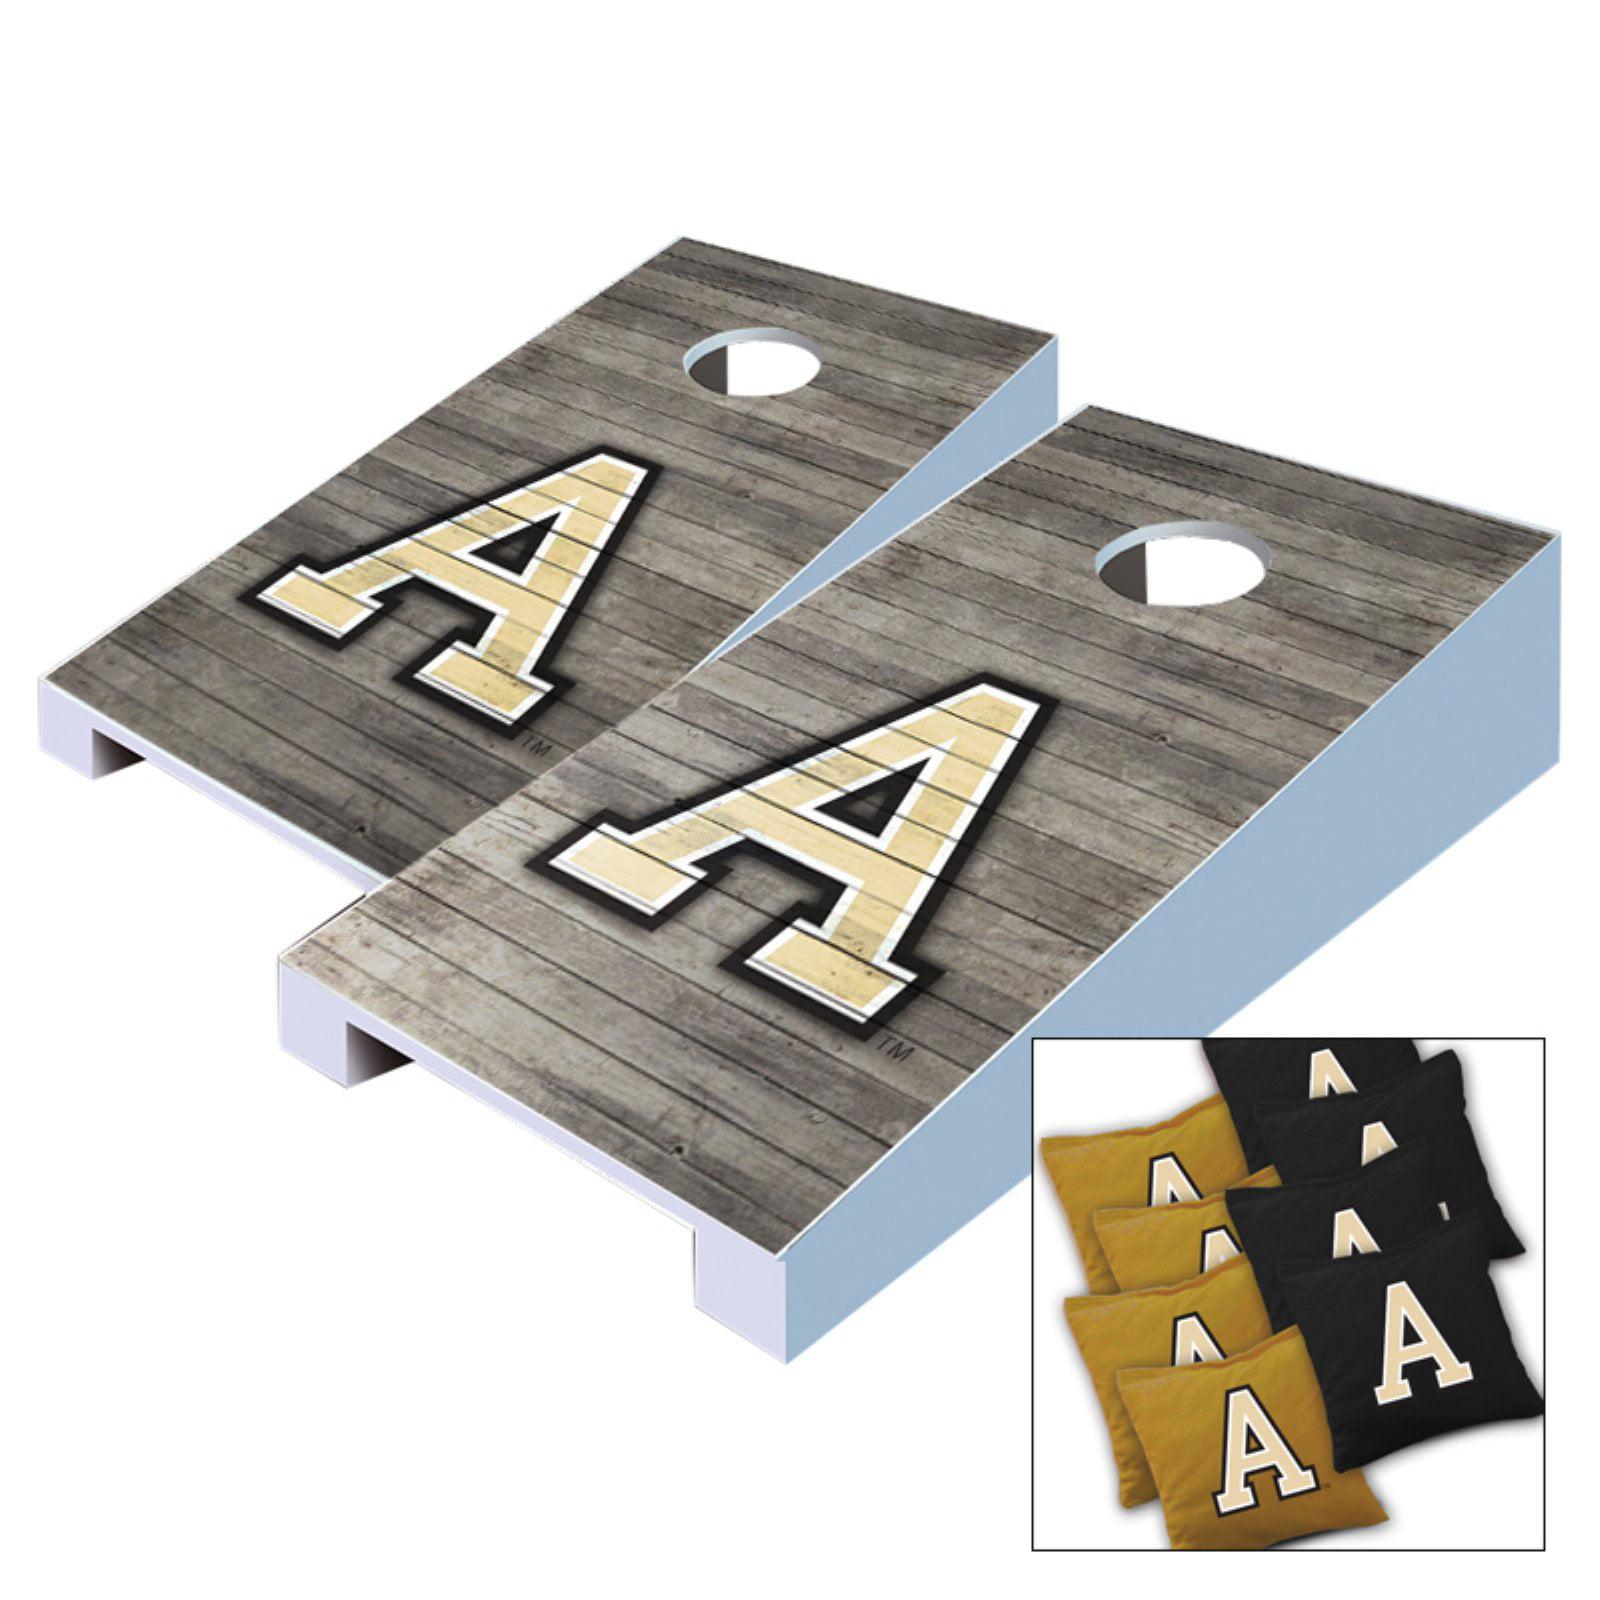 NCAA Army Black Knights Distressed Tabletop Cornhole Set by AJJ Cornhole